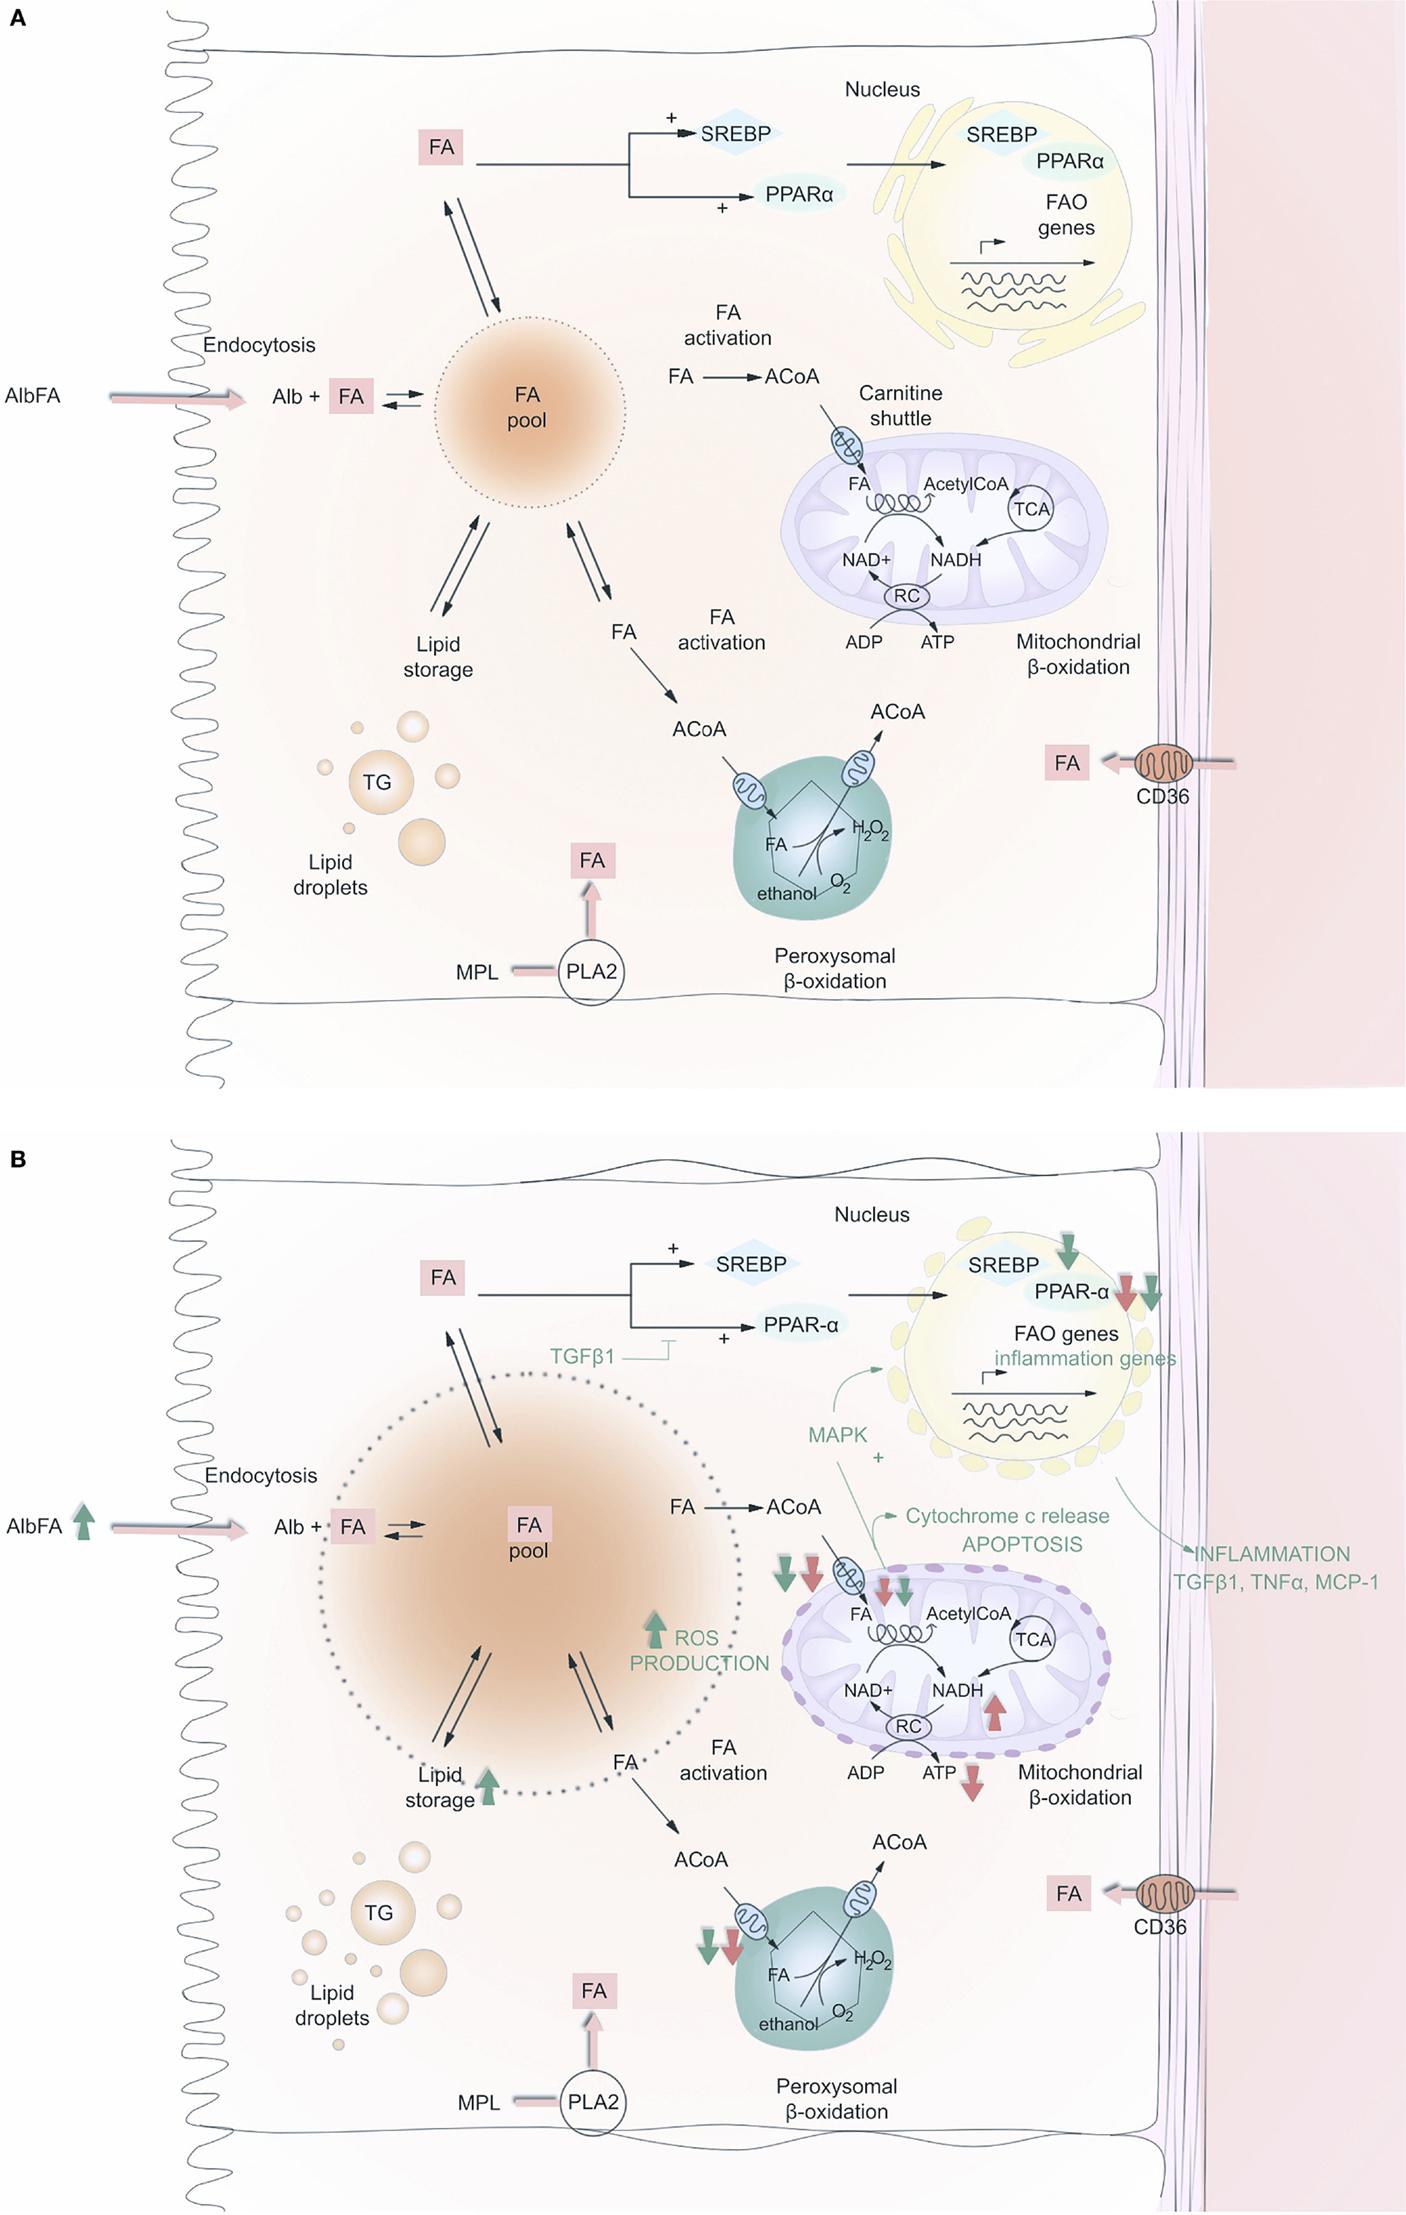 anabolic and catabolic processes